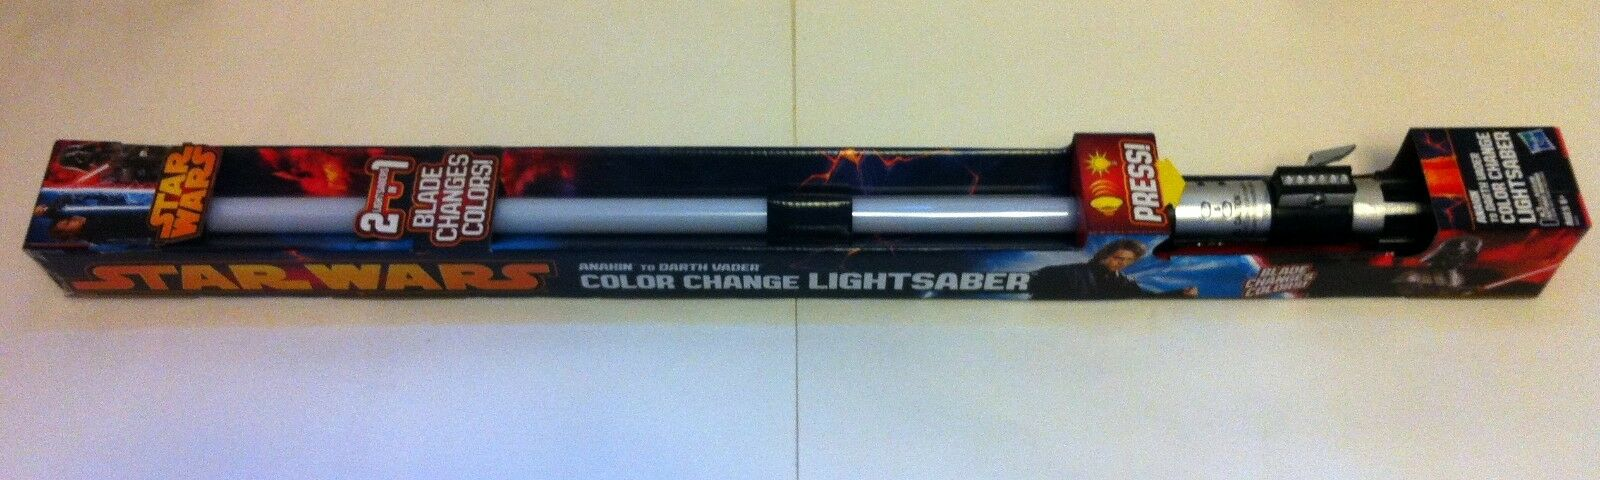 Hasbro Star Wars Anakin Skywalker Darth Vader Farbe Change FX Lightsaber 2013